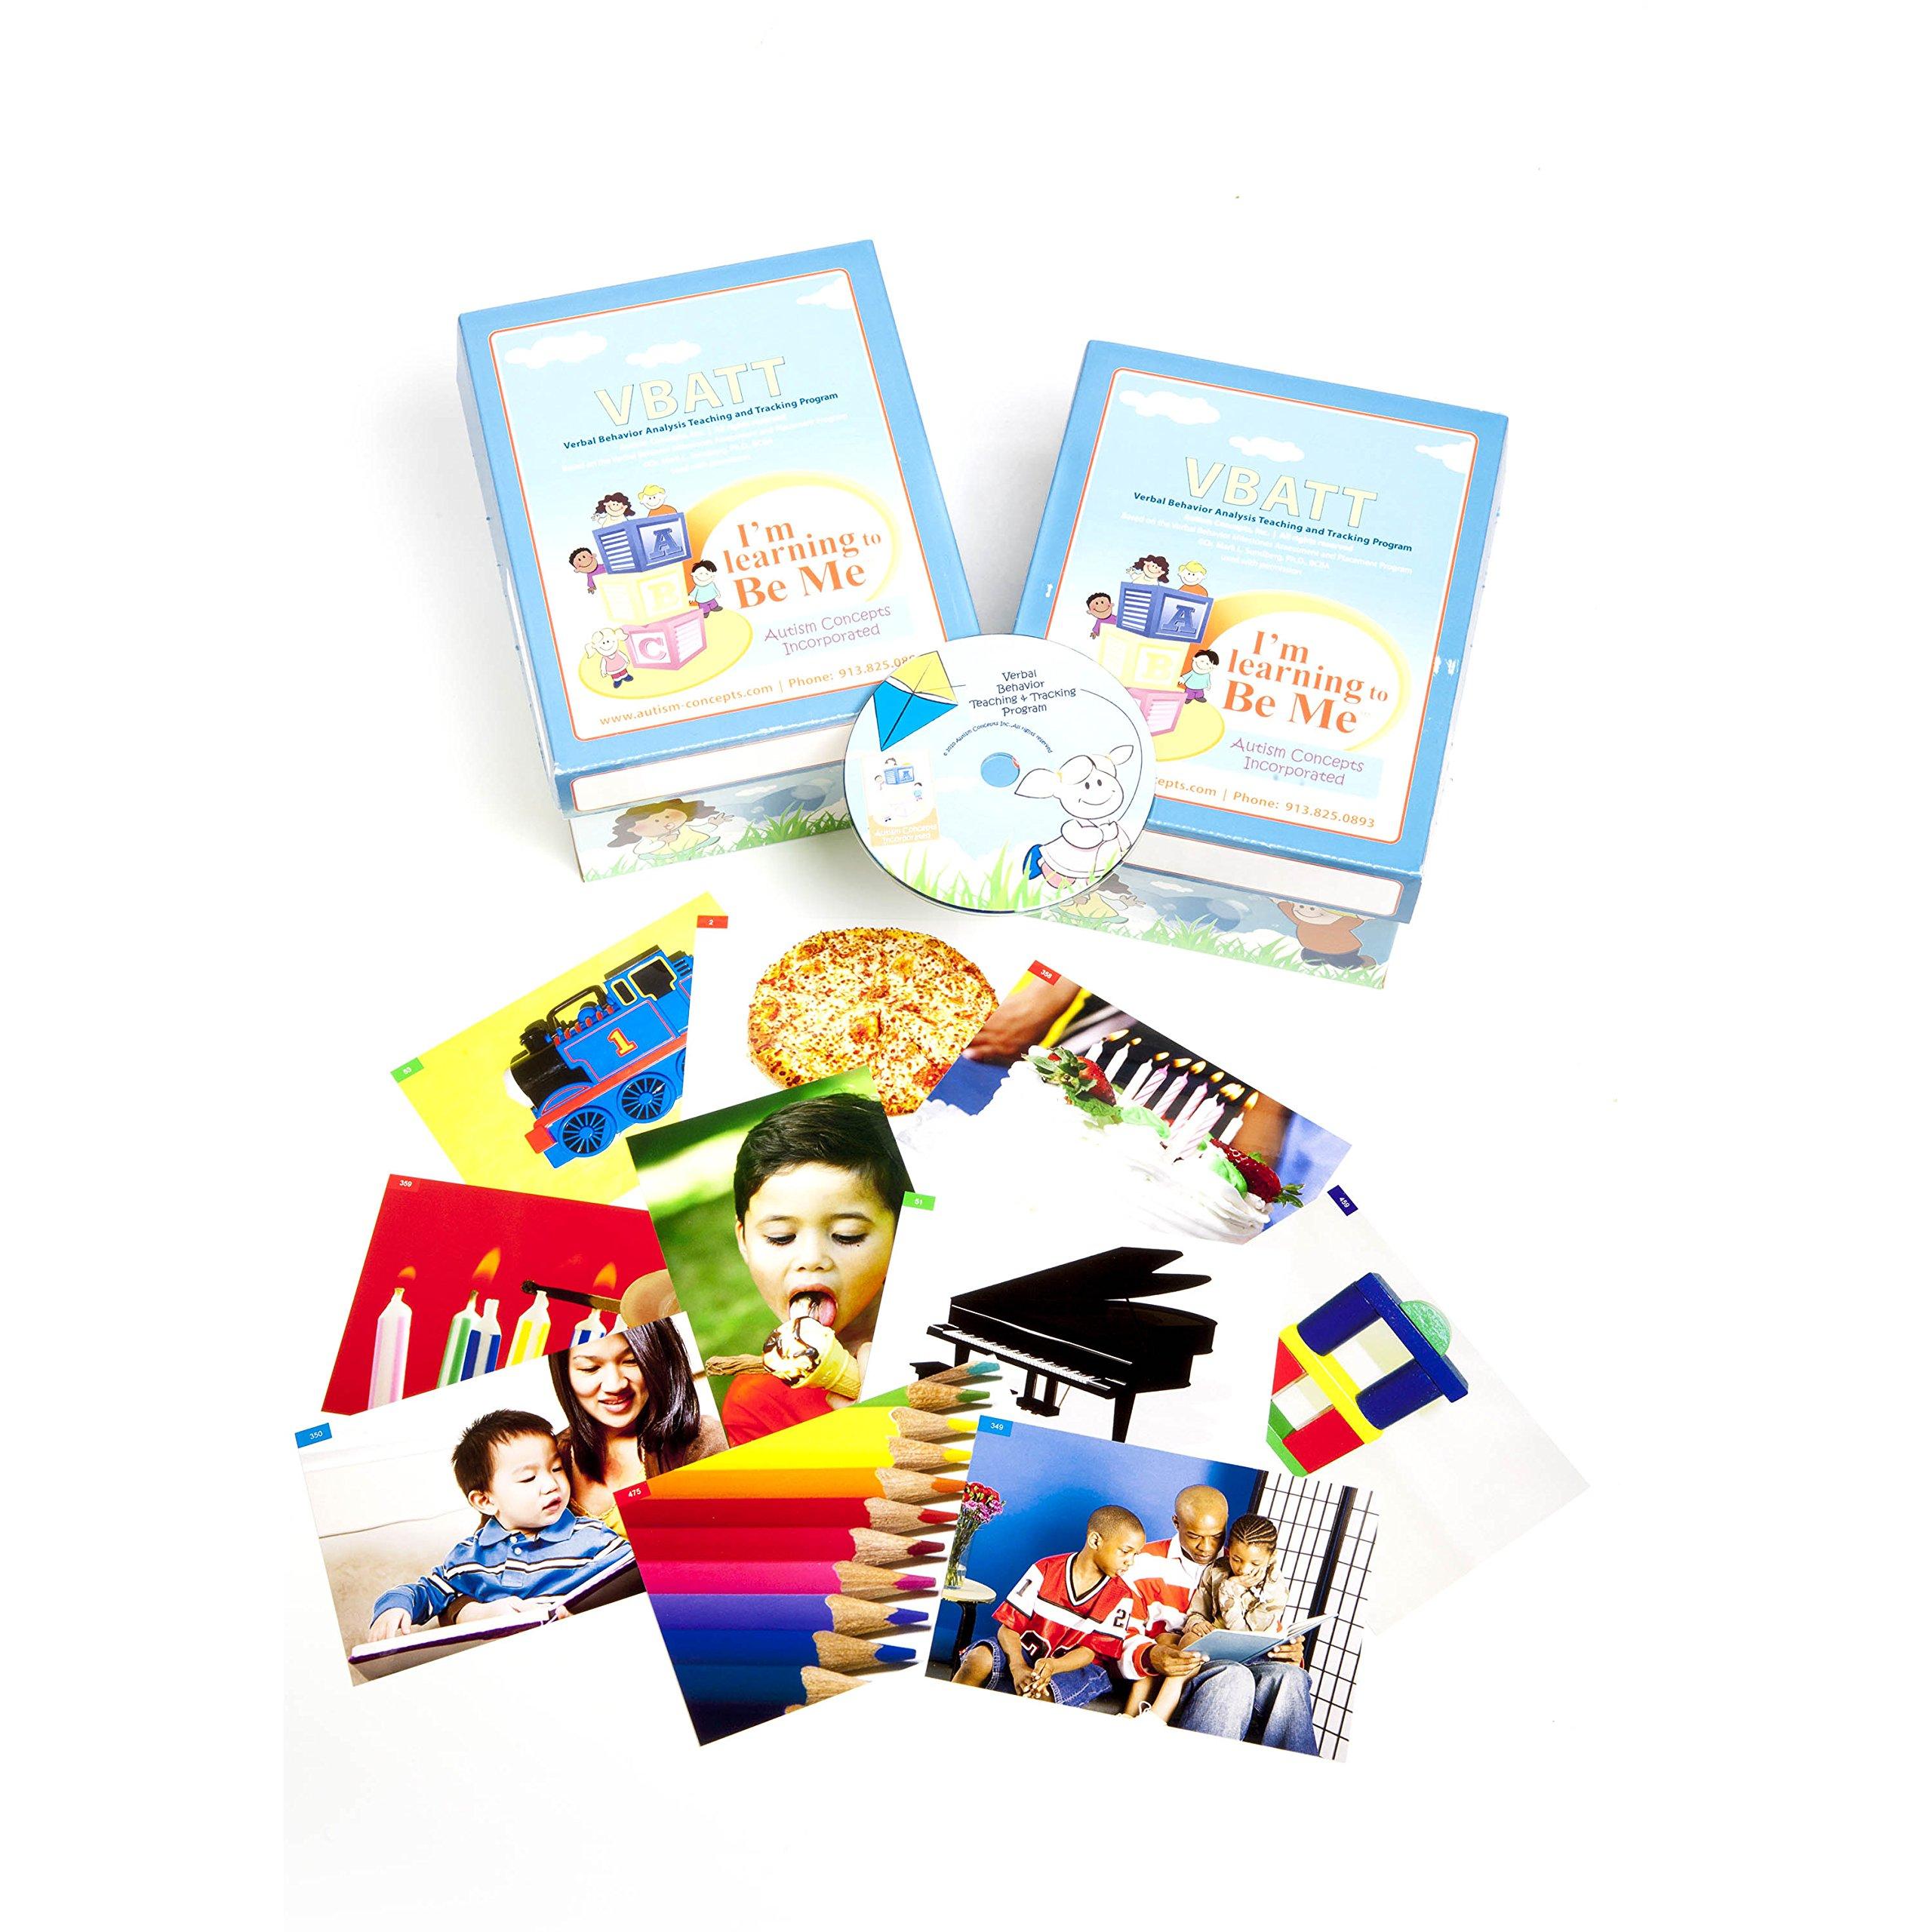 Autism Concepts, Inc. Verbal Behavior Analysis Teaching & Tracking Program: VBATT